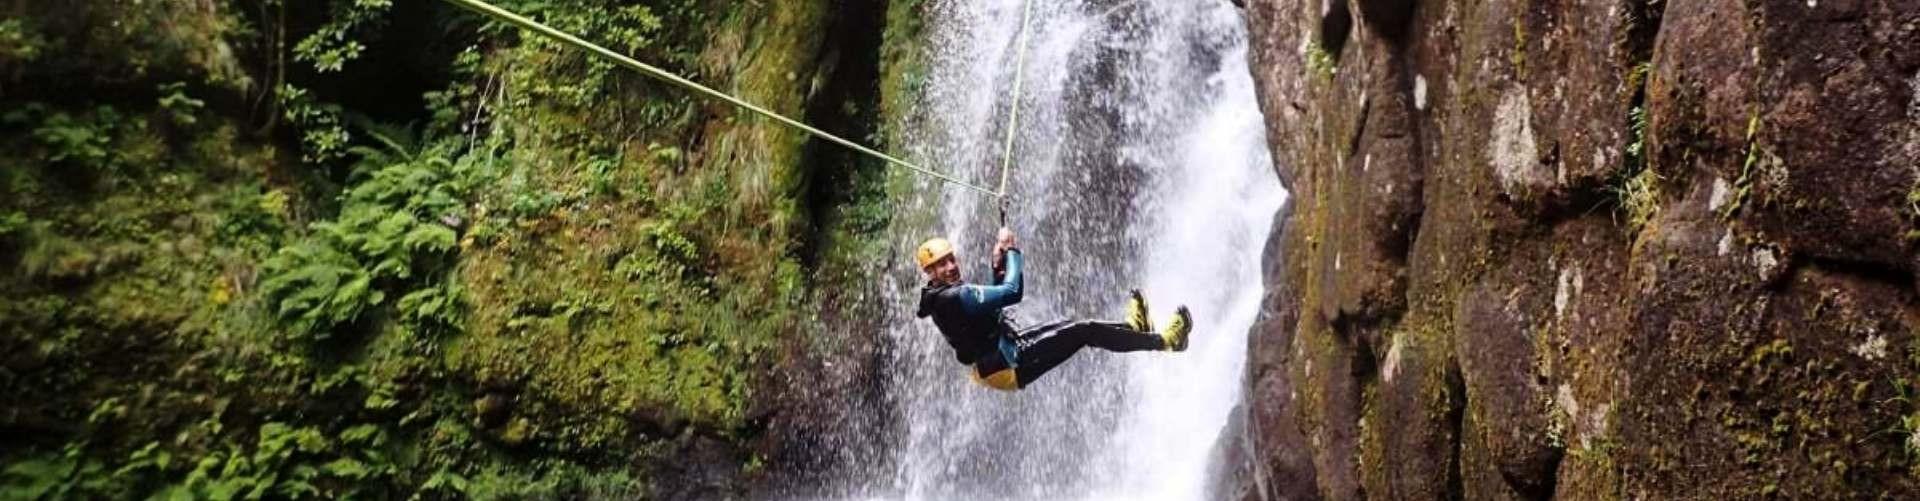 Canyoning na Madeira Ribeira do Lajeado Nivel 2